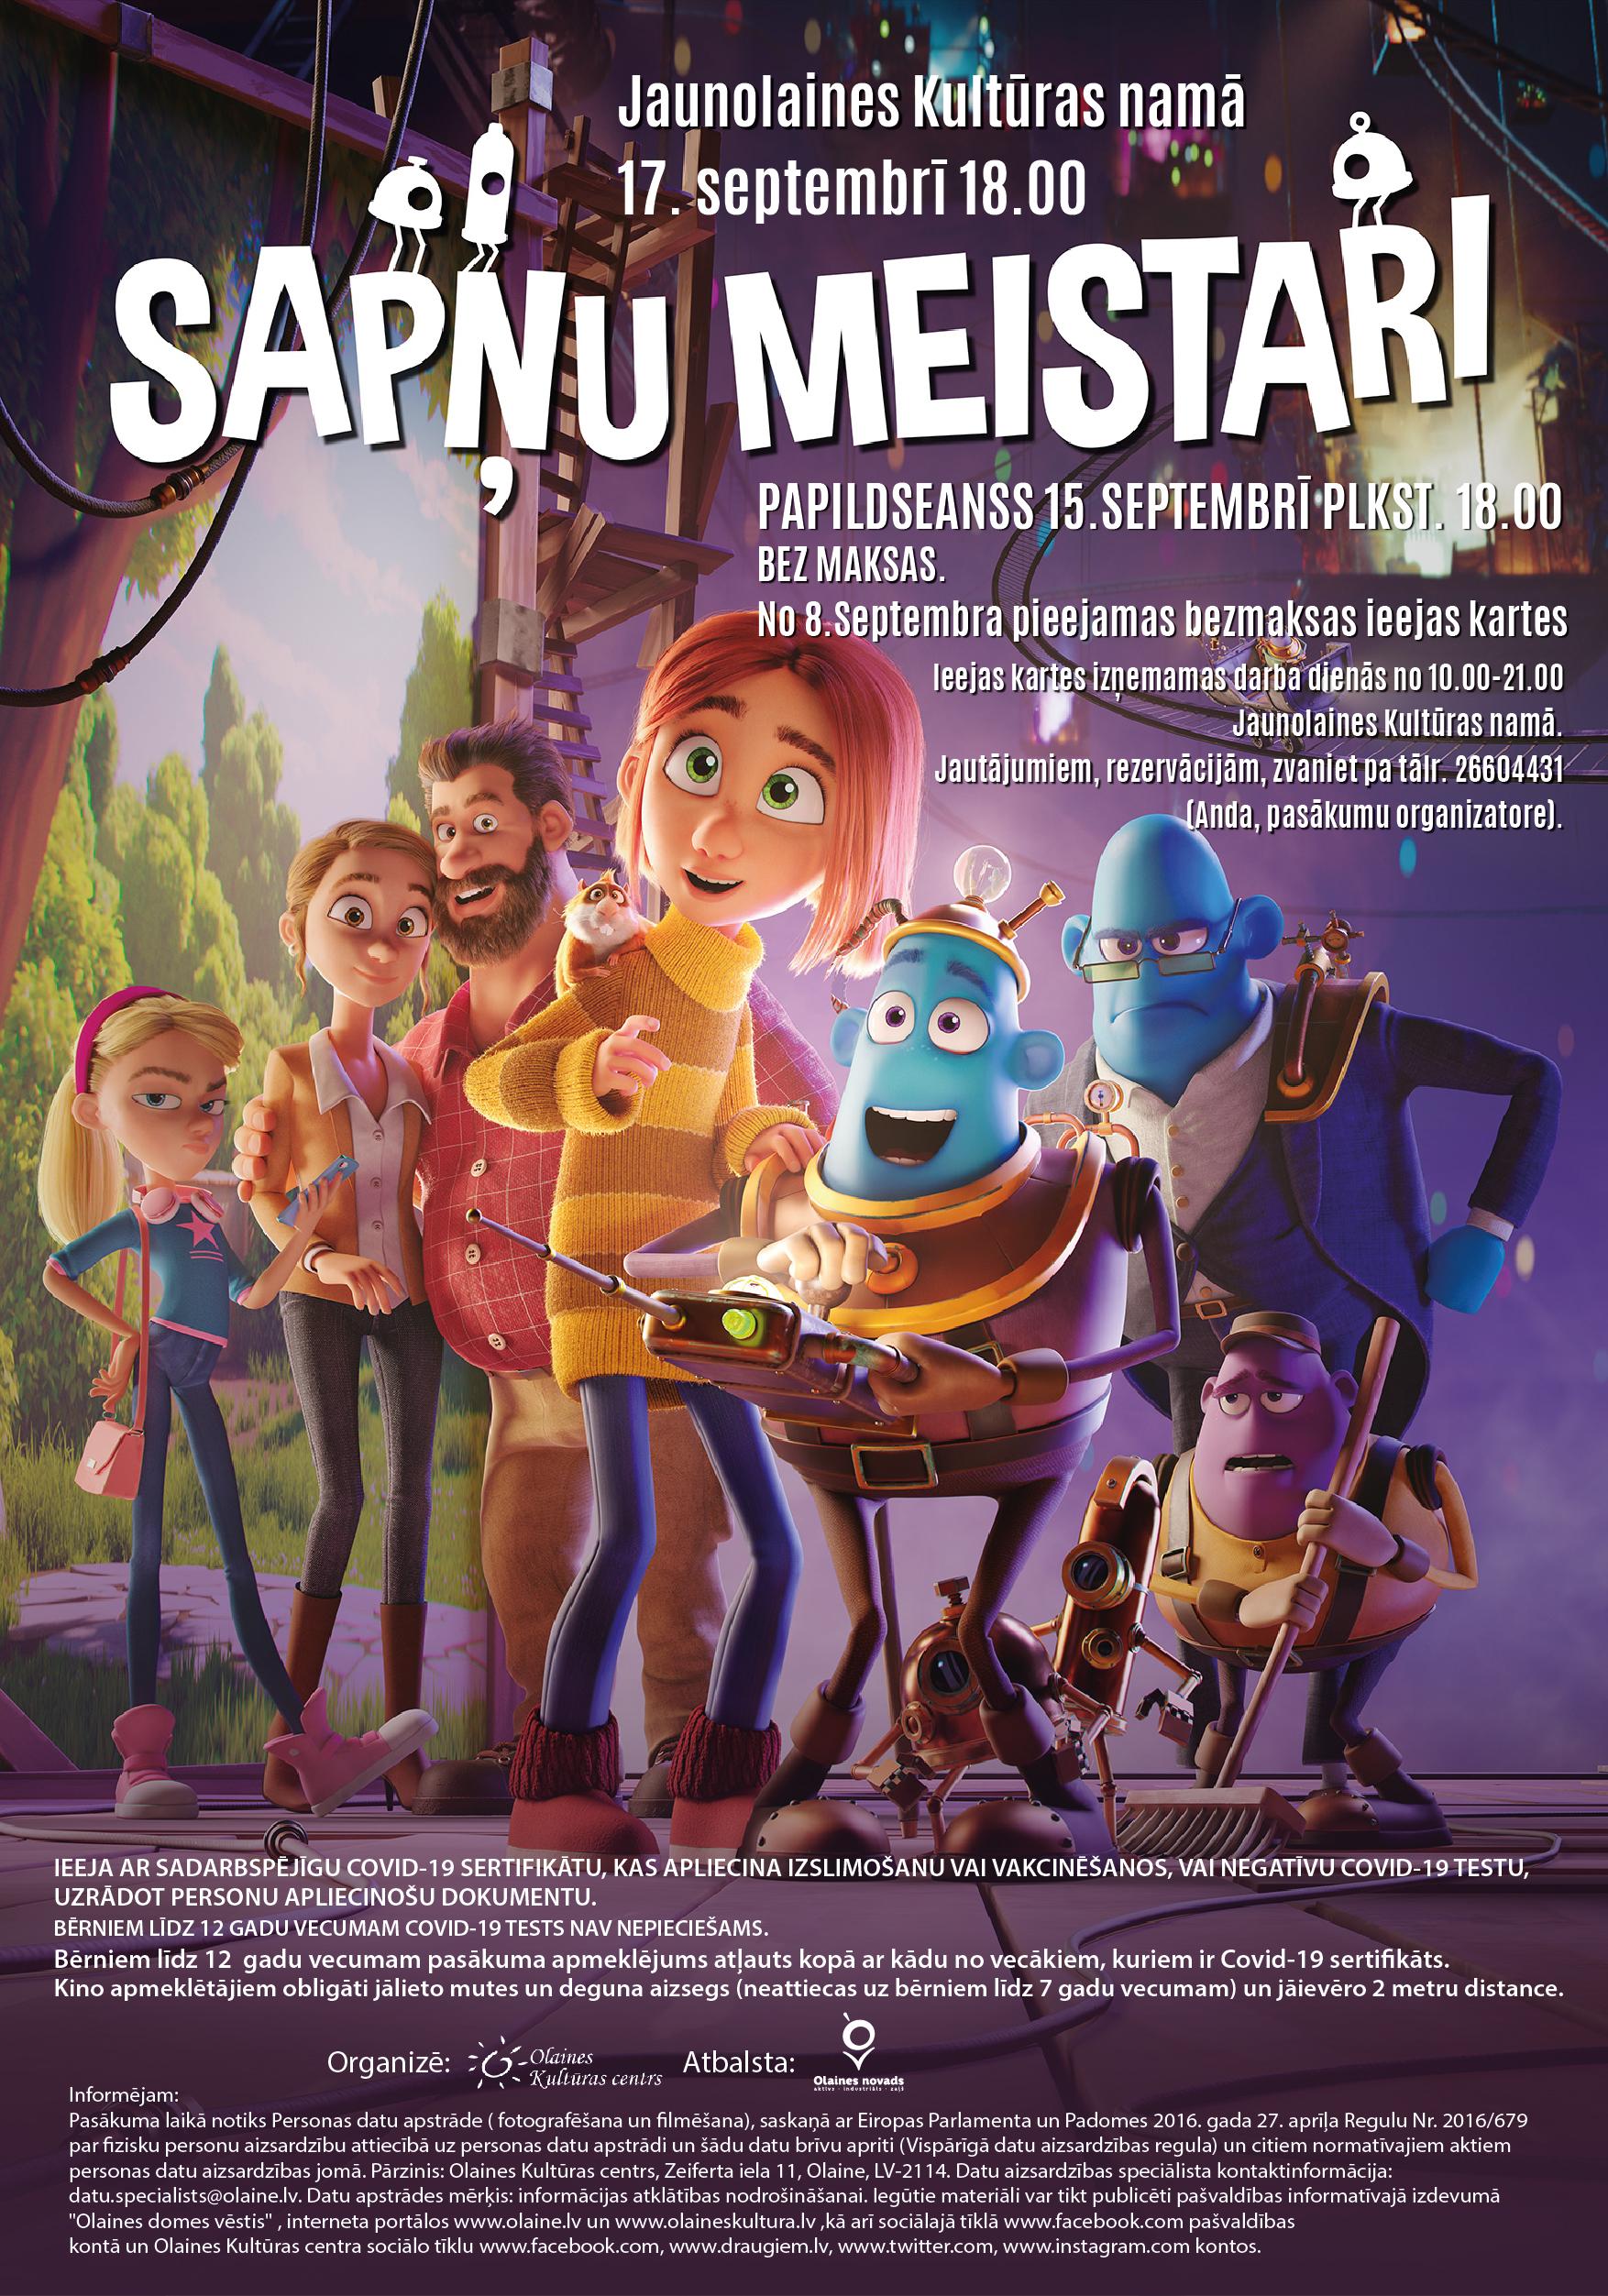 Papildseanss animācijas filmai